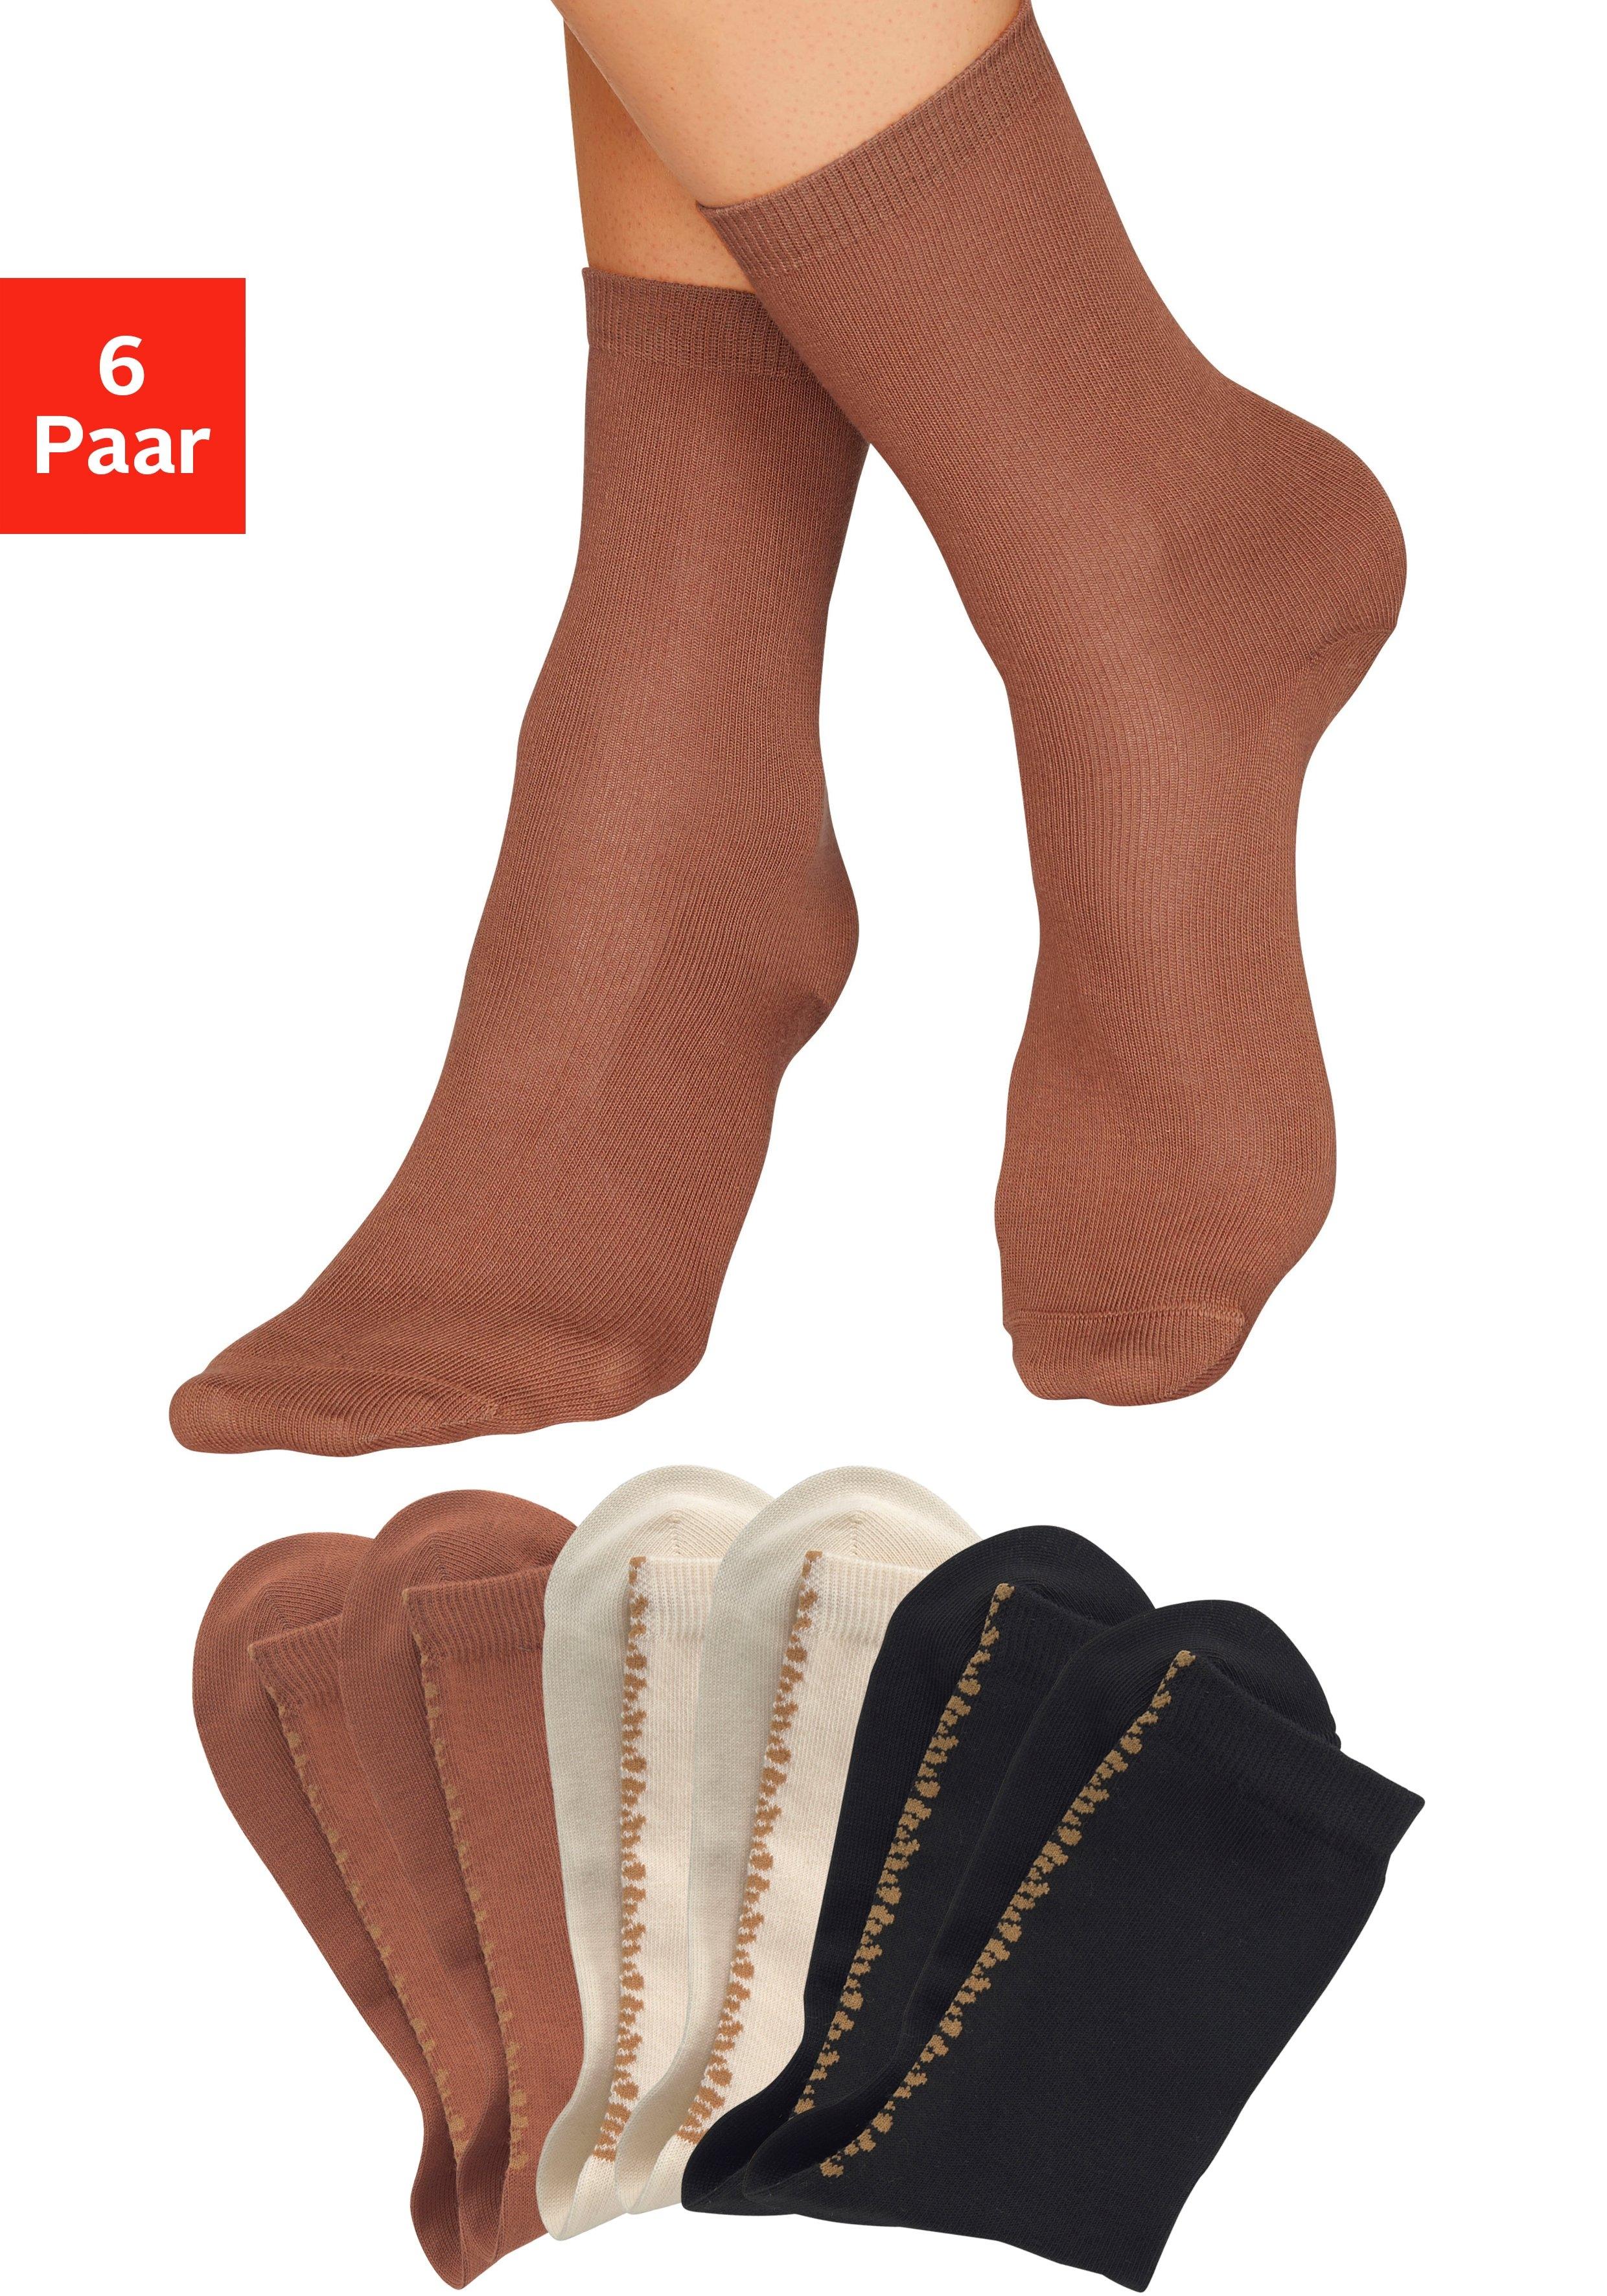 Buffalo sokken uni met luipaarddessin goedkoop op lascana.nl kopen